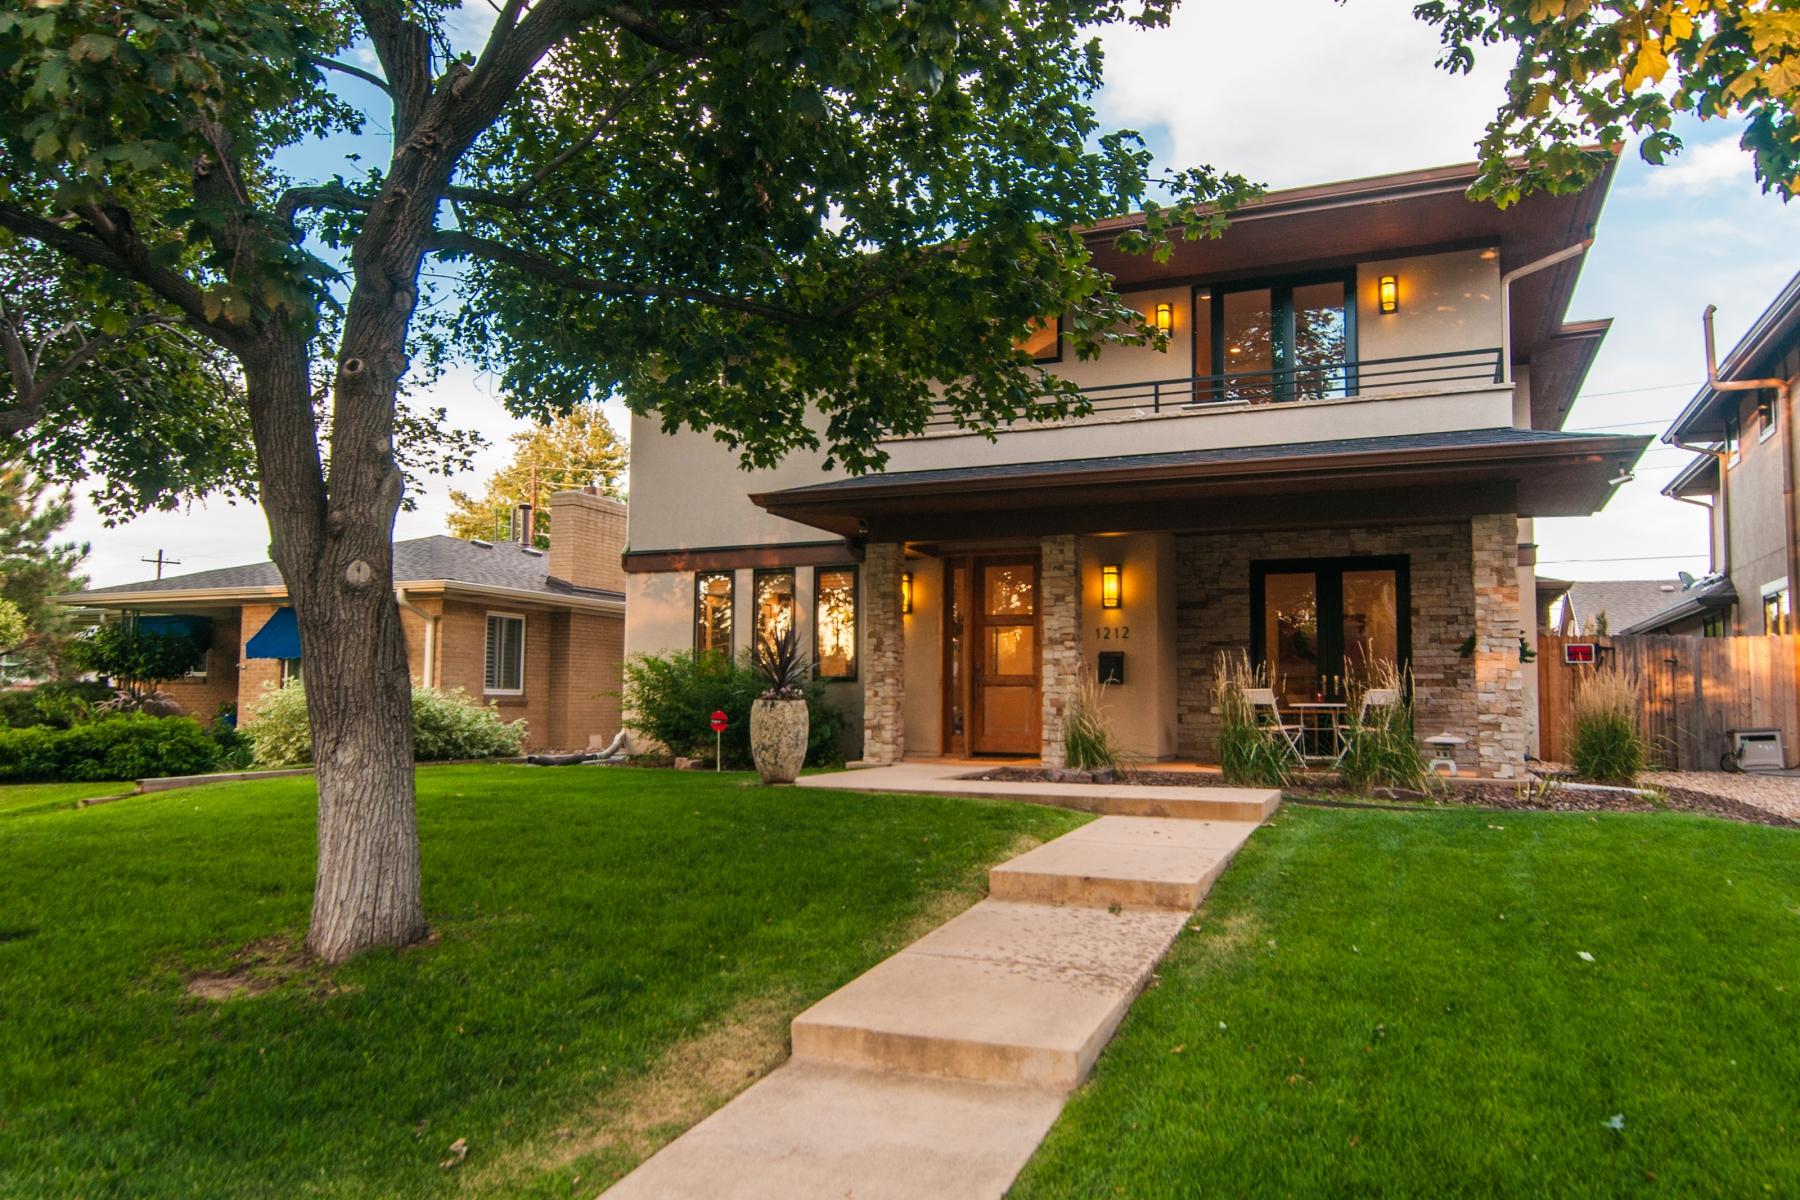 Moradia para Venda às Magnificent home located in the desirable Cory Merrill neighborhood 1212 S Saint Paul St Cory-Merrill, Denver, Colorado 80210 Estados Unidos